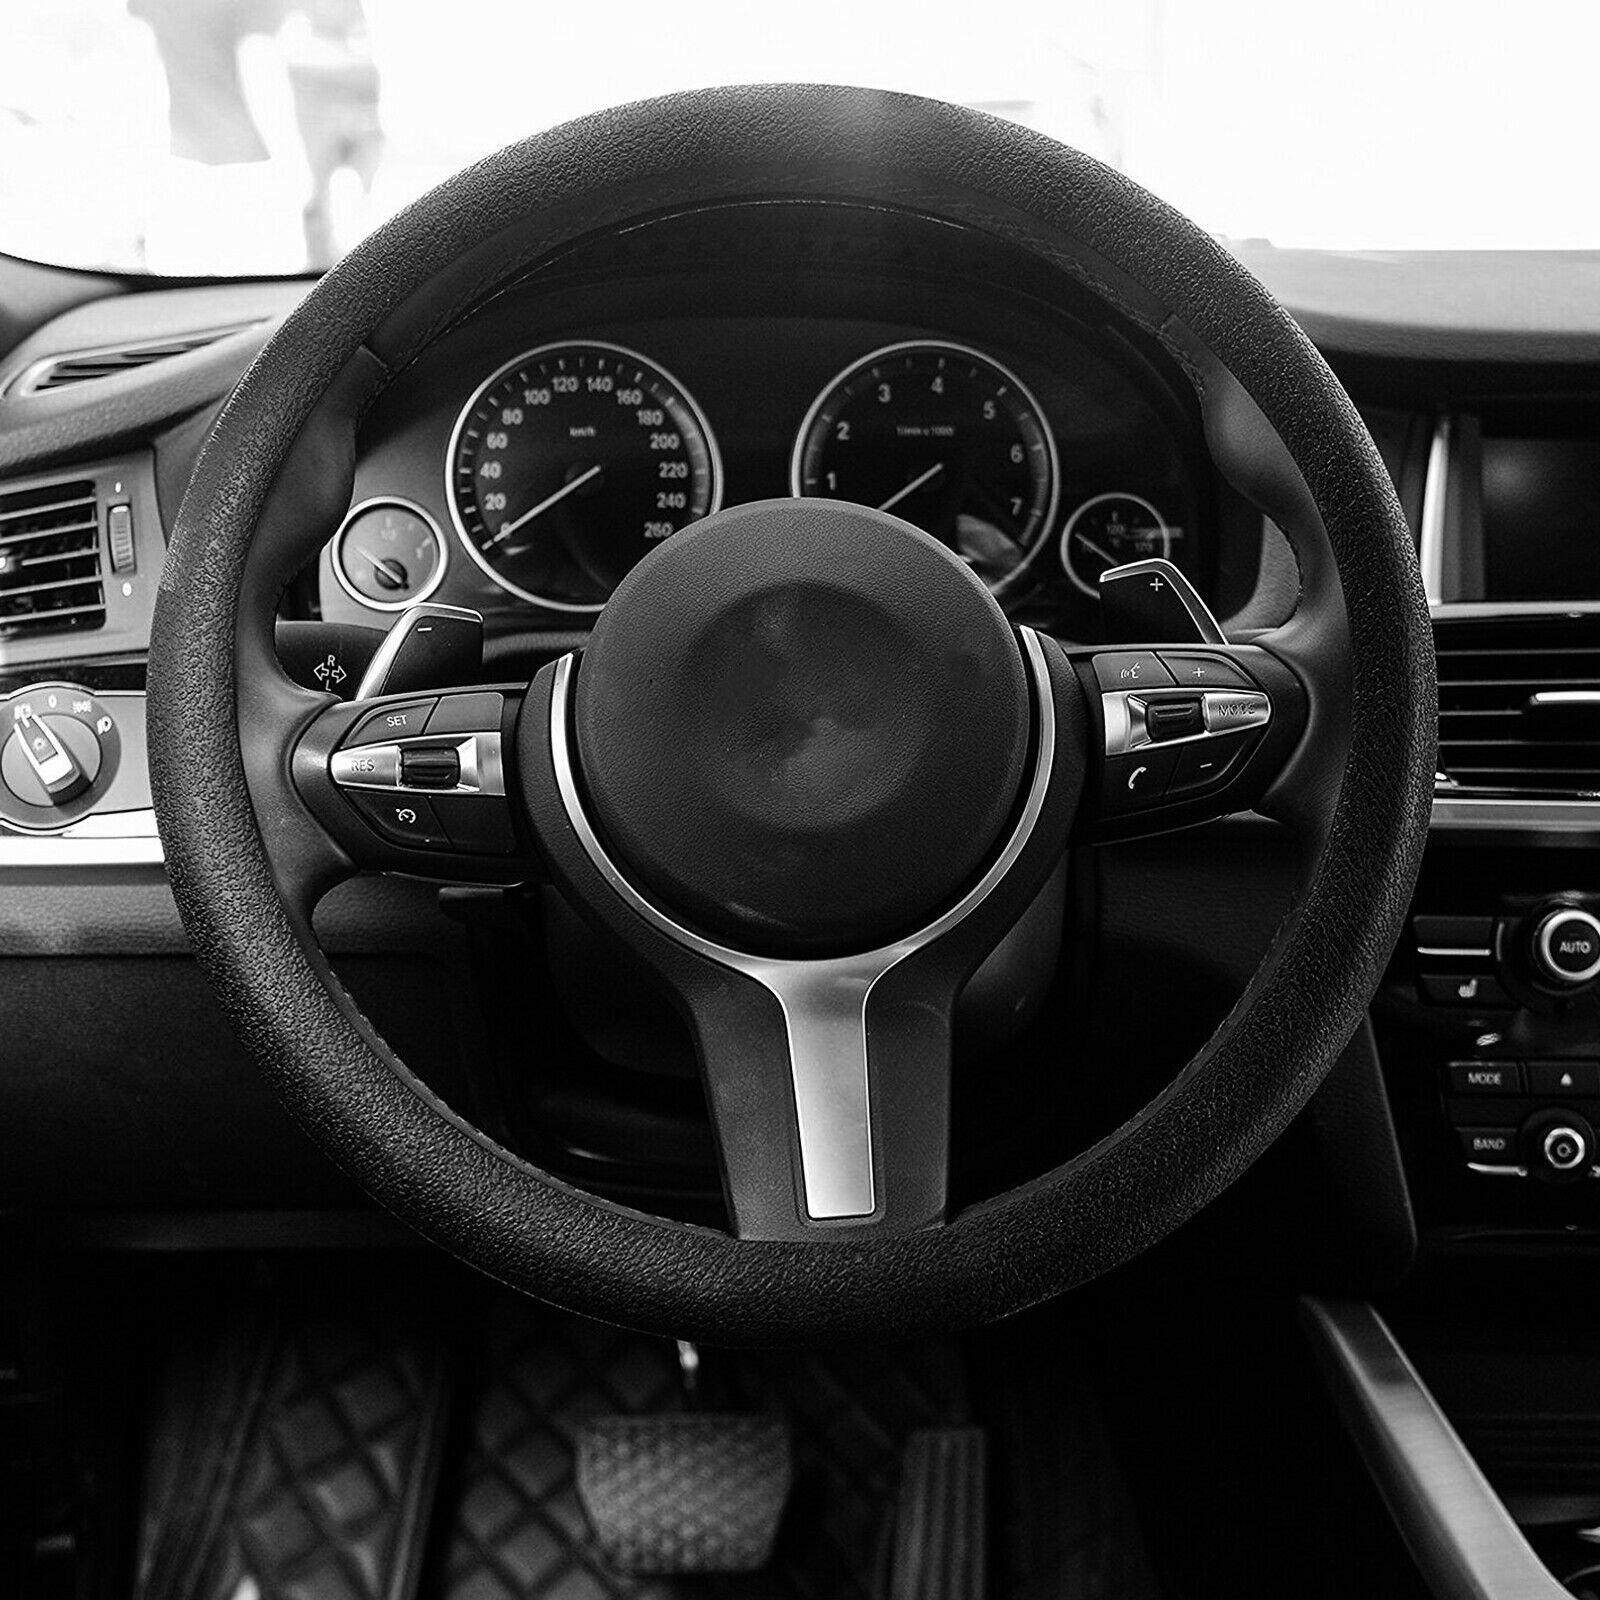 13″-15″ Soft Silicone Car Steering Wheel Cover Anti-static Non-slip Black USA Car & Truck Parts